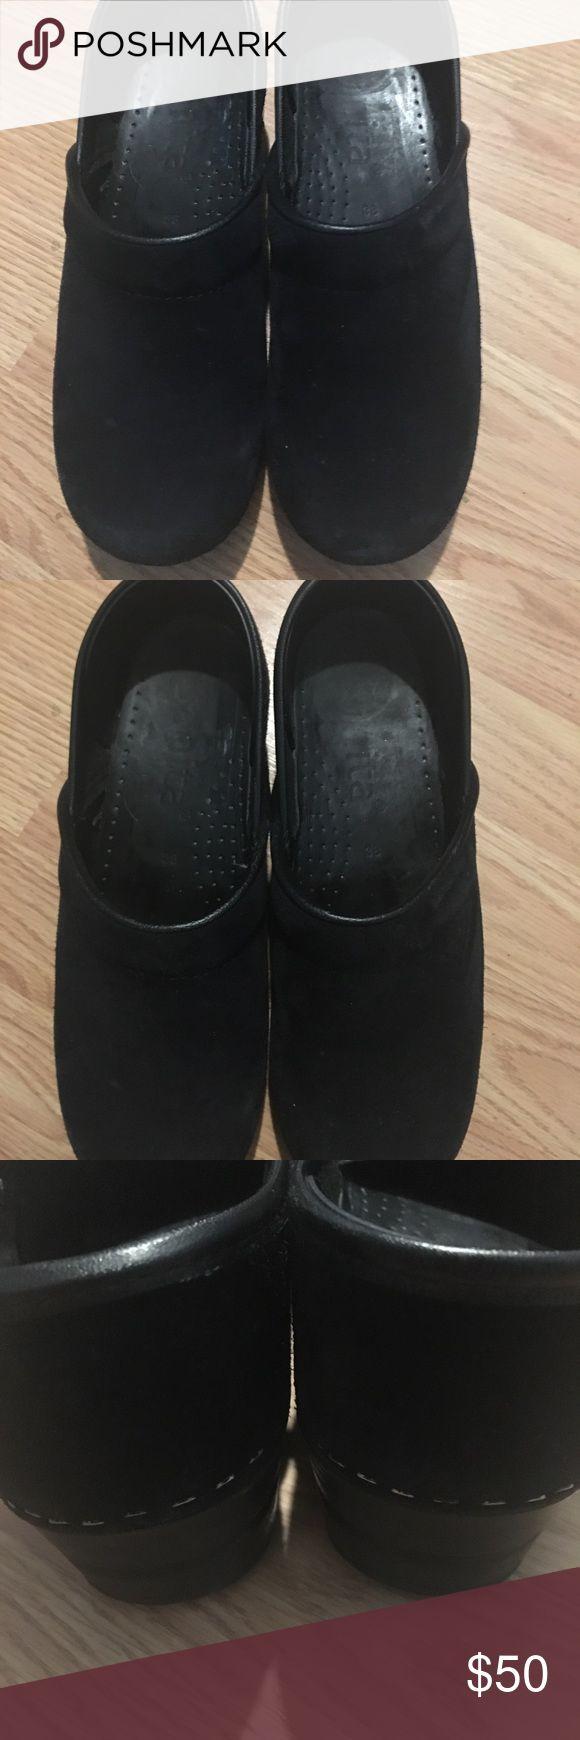 Sanita shoes Dark navy blue great condition Sanita Shoes Mules & Clogs